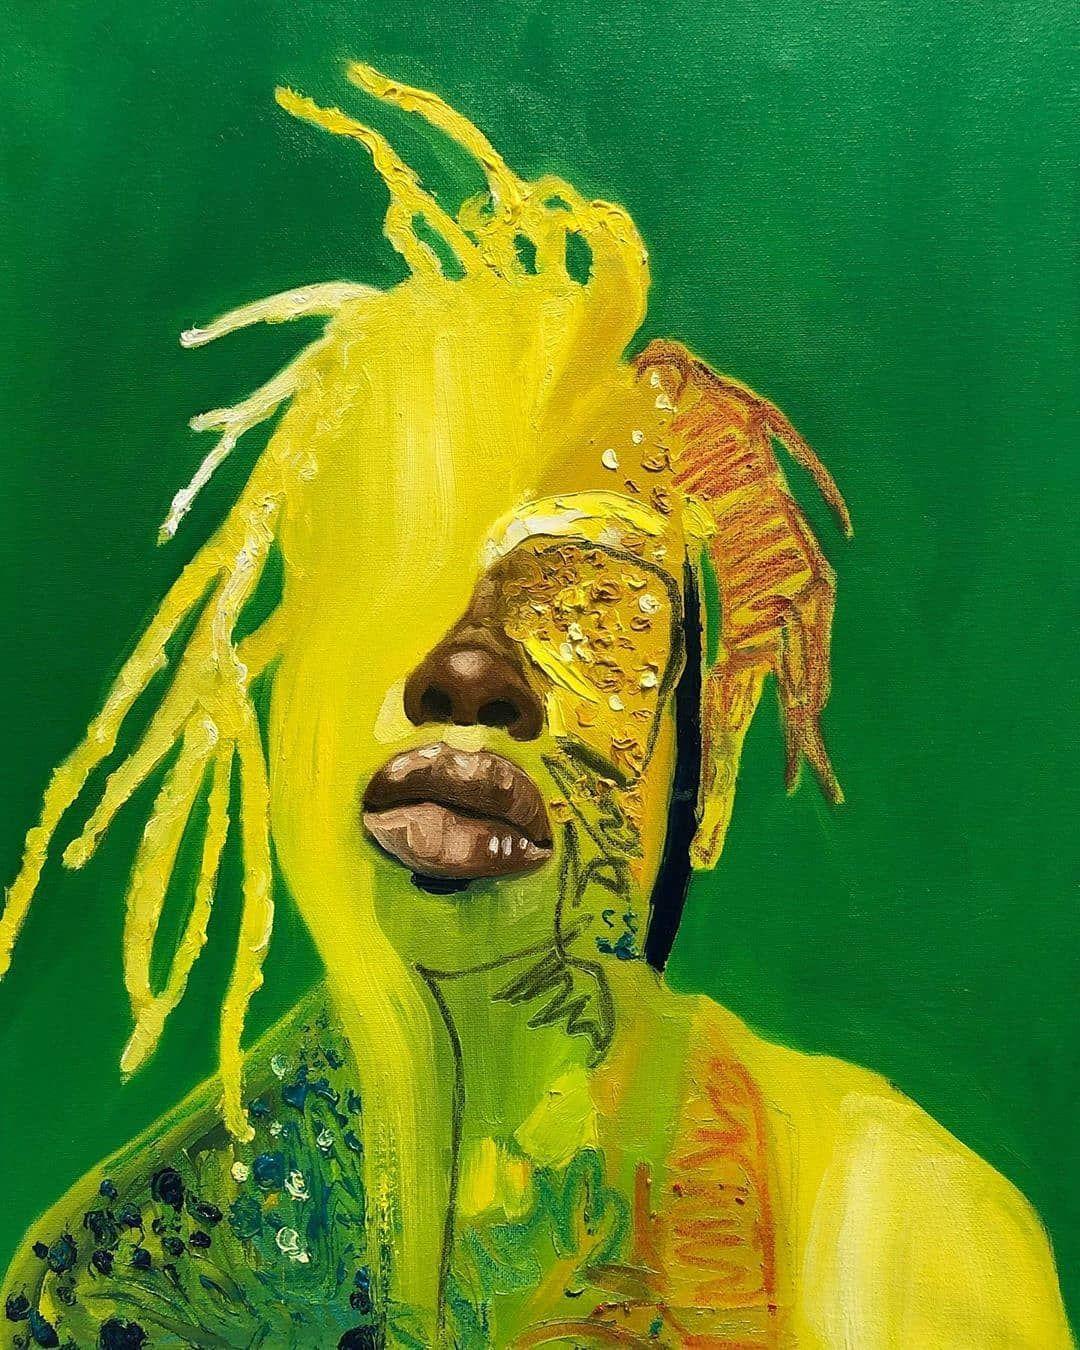 Love this 👌🏽🎨 #dopeblackart by @khari.raheem - inspired by  @cathalyse and @_bluew3rd photo skills . . #art #blackart #artoftheday#artfeature #artdaily #igart#digitaldrawing #realisticdrawing #pencildrawing #artspotlight #igartist #drawing #coolart #dopeart #blackartwork #artgallery #supportblackart #blackartist #coolartwork #artfido#artlife #artwork #dopeblackartist #dopeblackart #Artistatwork #dopeartistatwork . . For art subs or any business >> dopeblackart.com